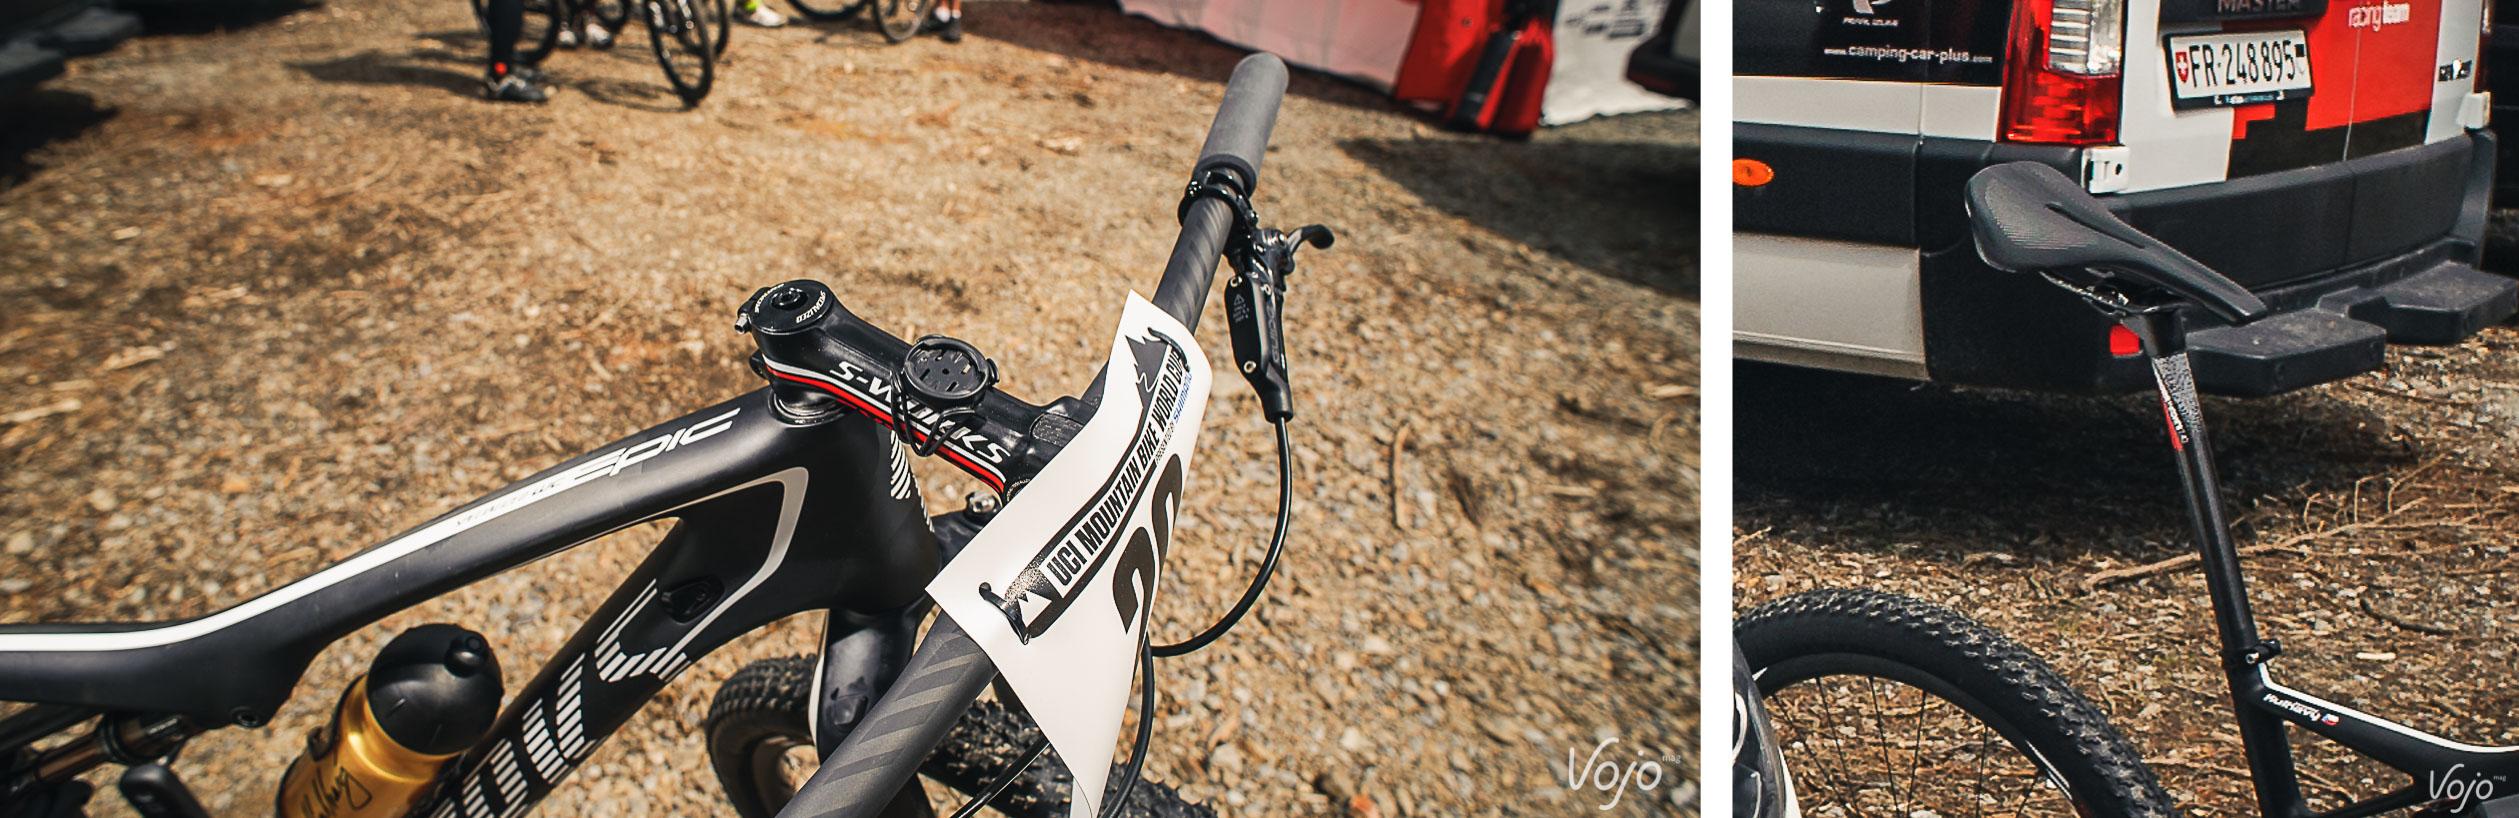 3-World_Cup_MTB_Pro_Bike_Check_Specialized_Epic_Jaroslav_Kulhavy_Copyright_OBeart_VojoMag-1